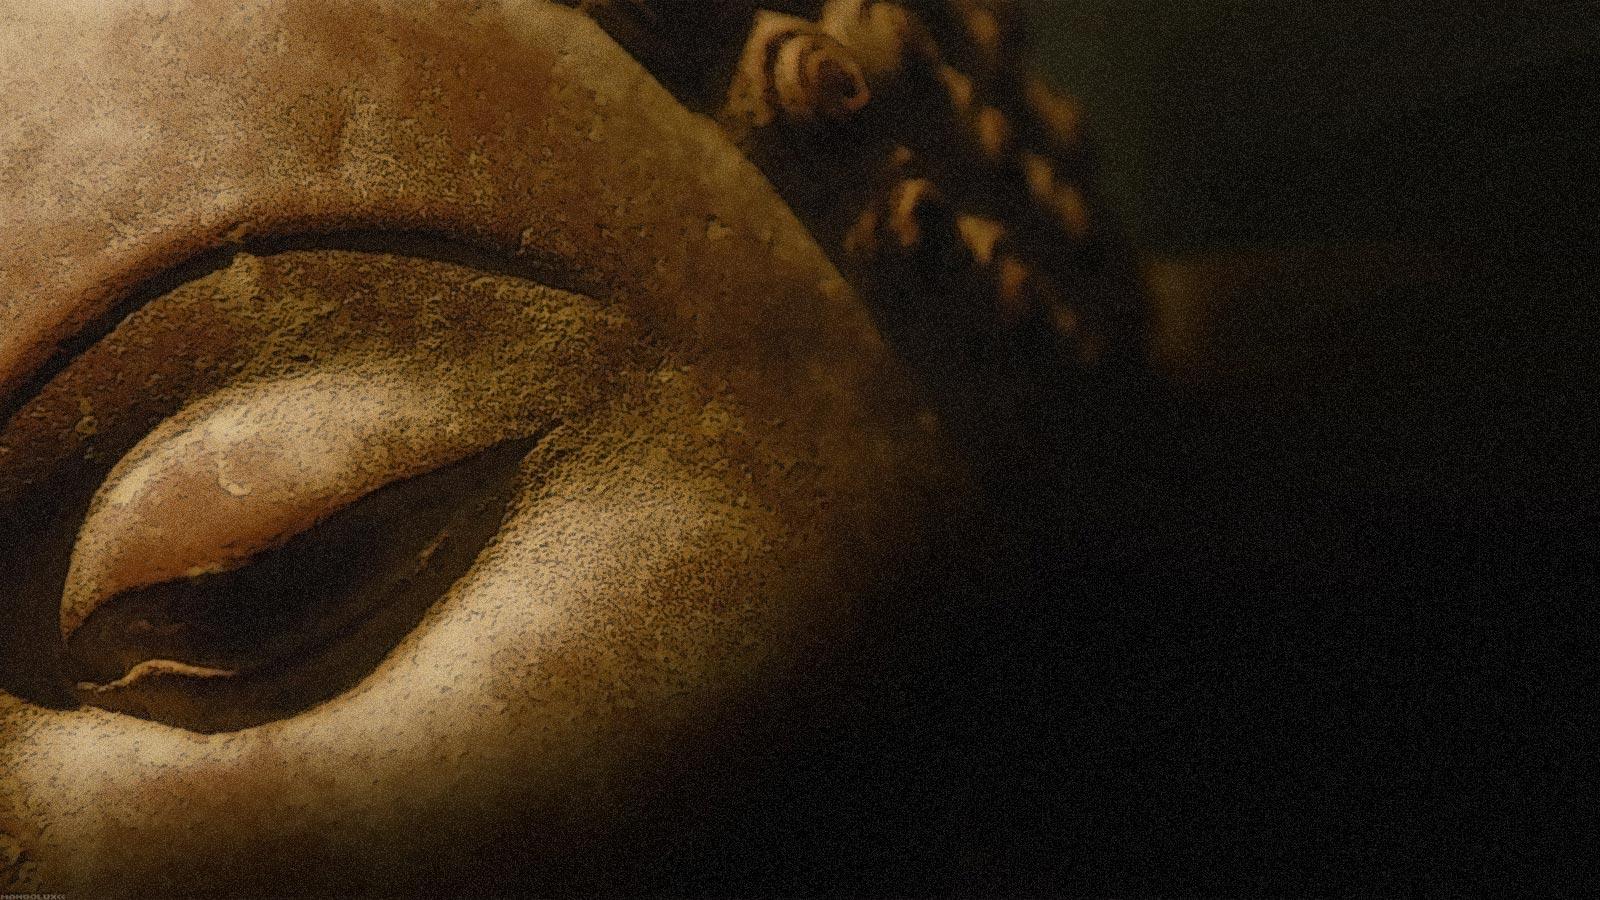 http://1.bp.blogspot.com/-xeZrfmbzF1o/UIkM66kX2_I/AAAAAAAABvQ/S1h6x9Ow-iE/s1600/buddha_gotama_siddhartha_meditation_wallpaper.jpg